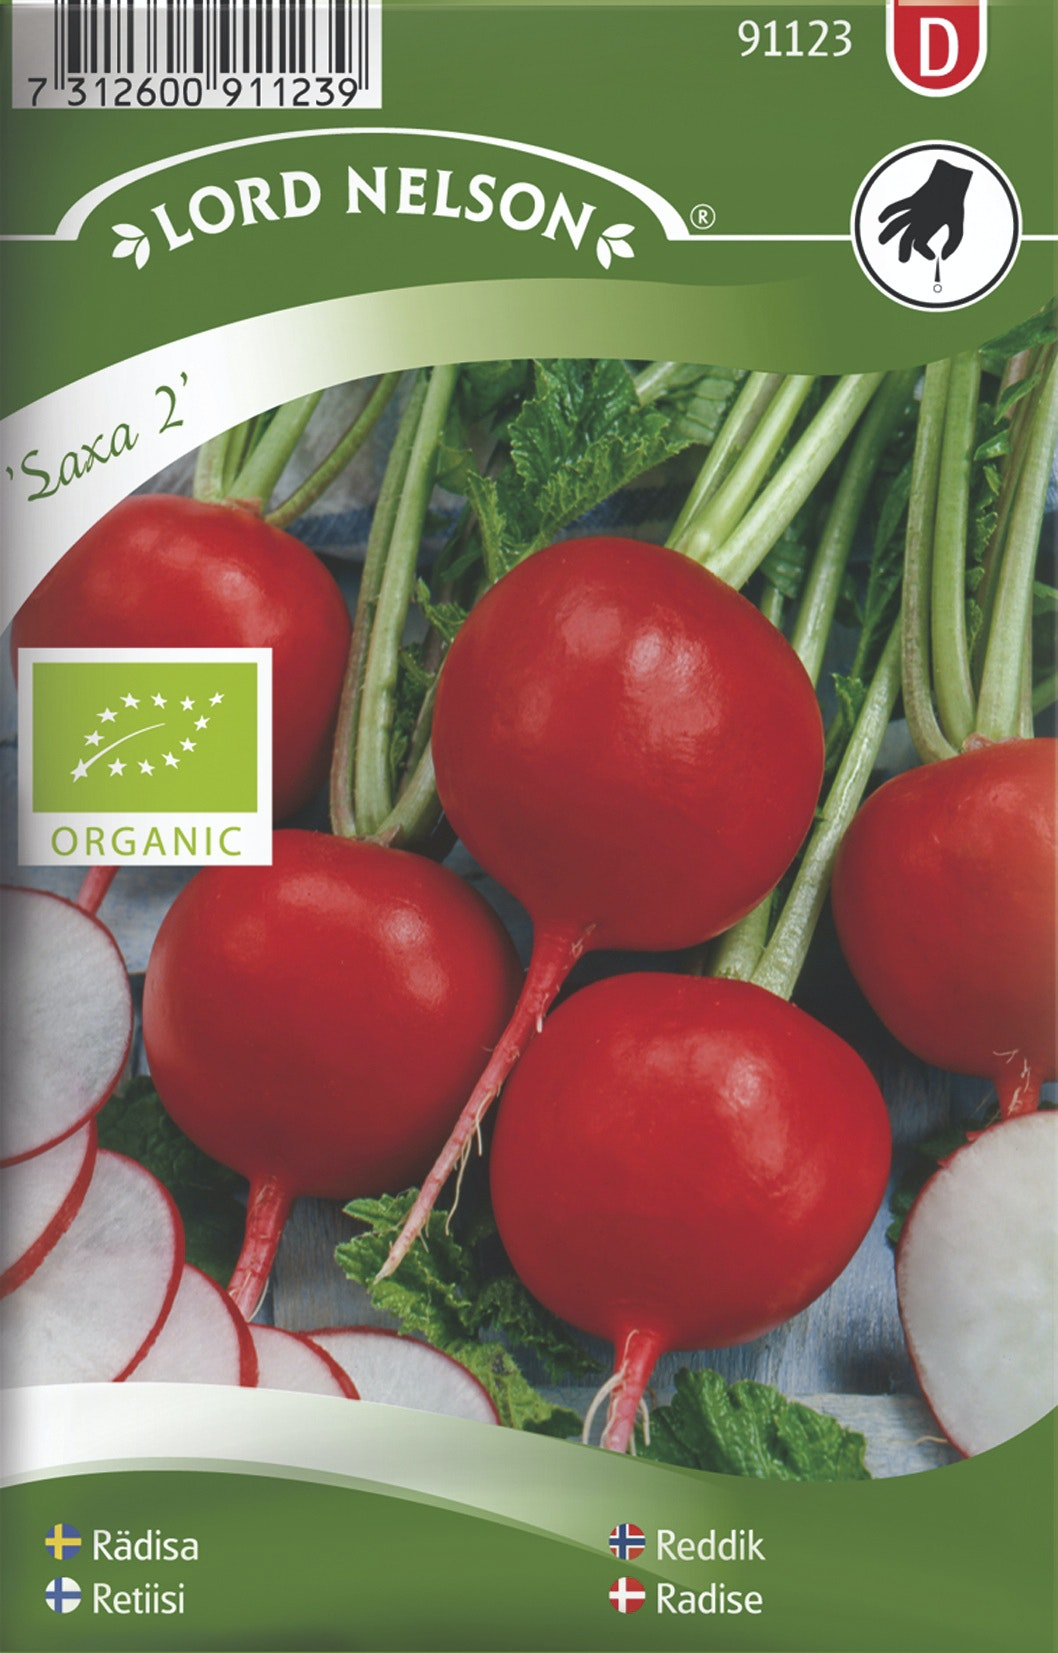 Rädisa Lord Nelson Saxa 2 Rund Organic